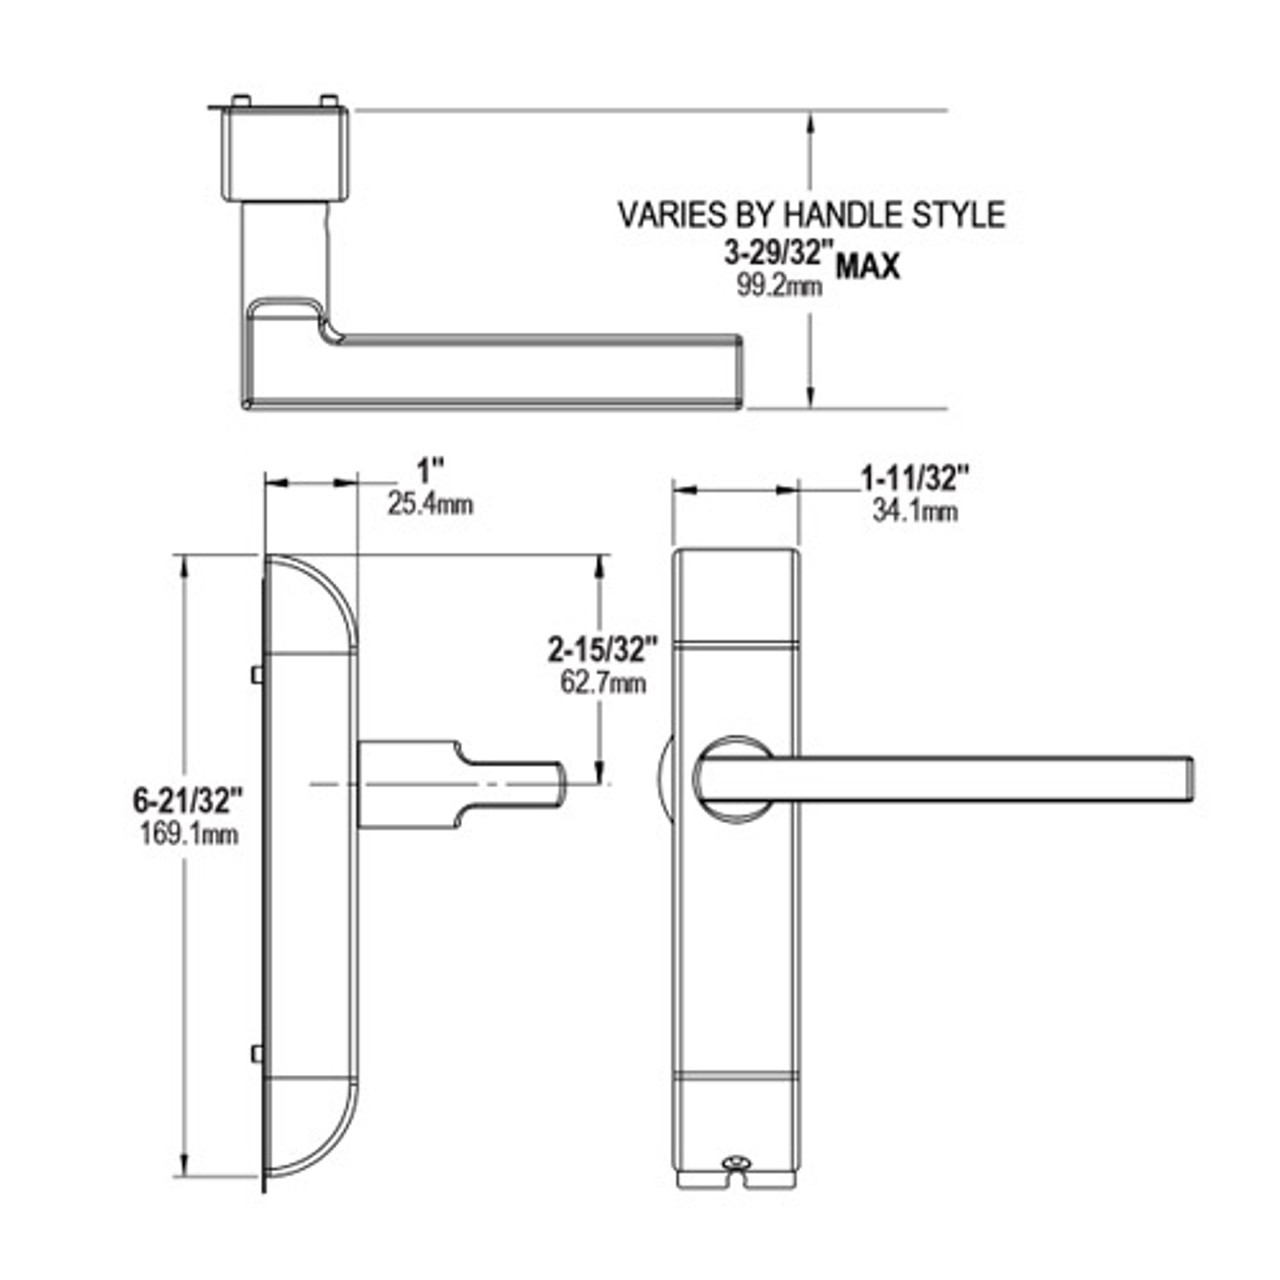 4600M-MD-532-US32 Adams Rite MD Designer handle Dimensional View